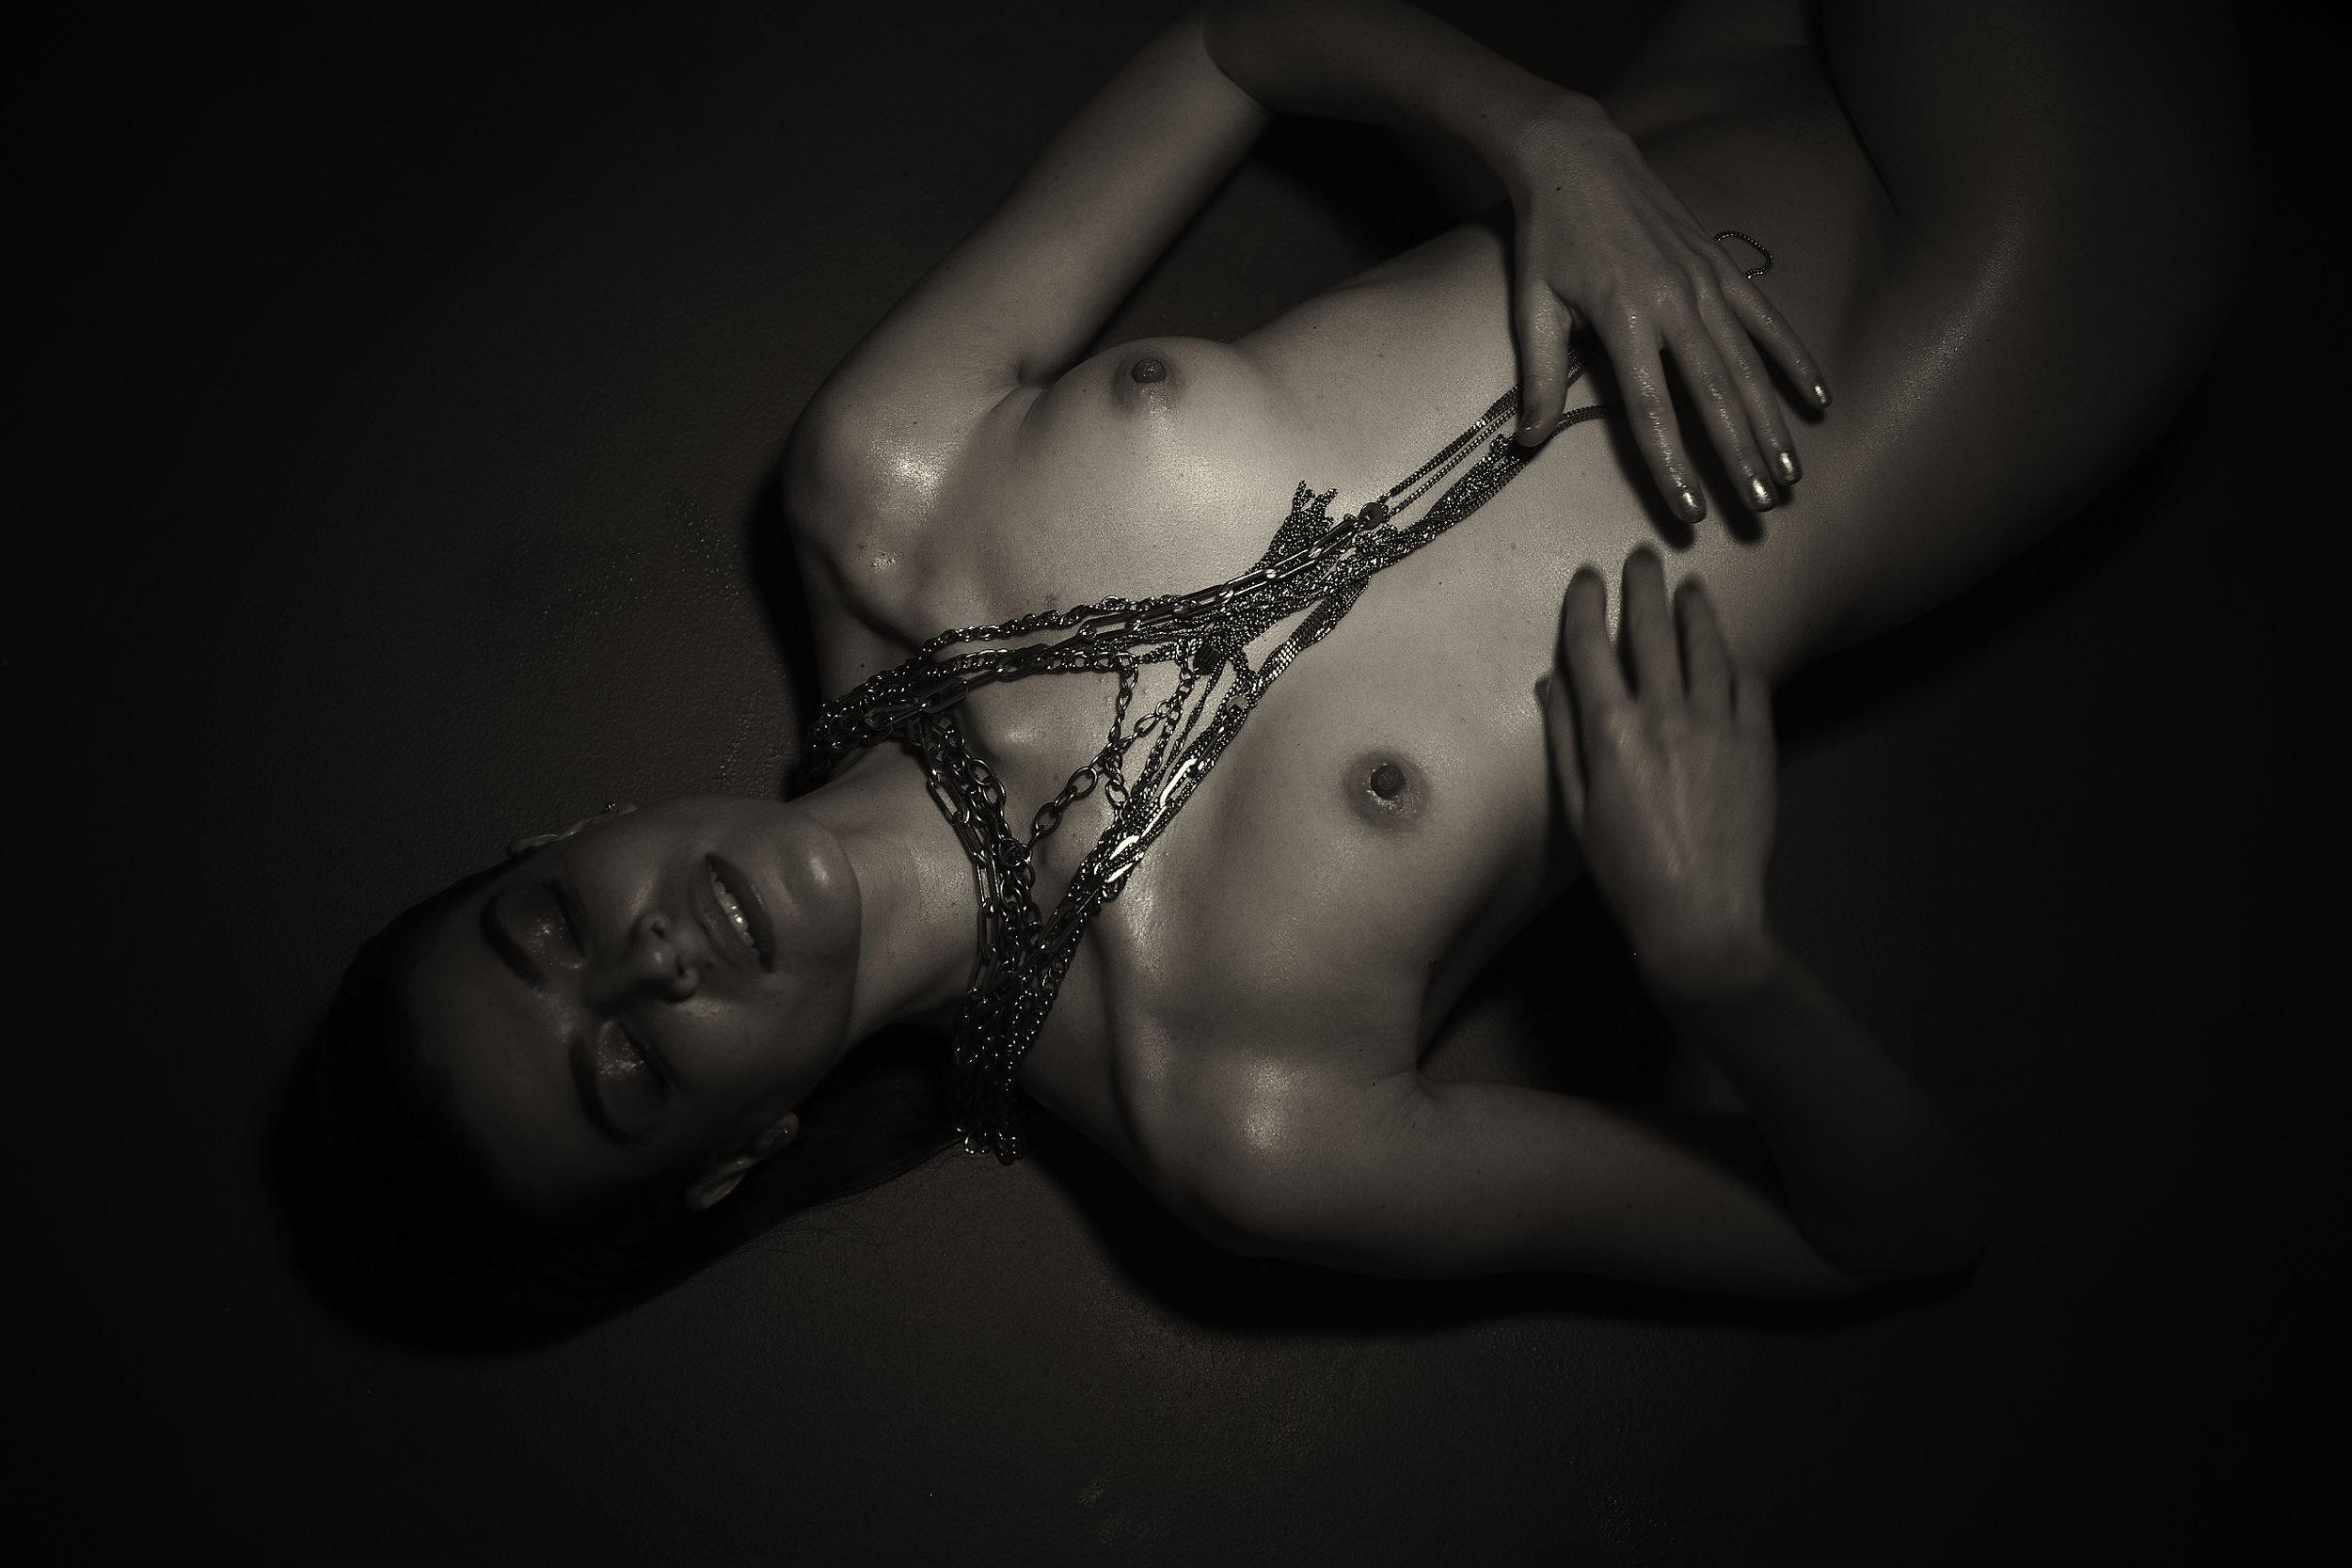 Fays_Chains_21392.jpg